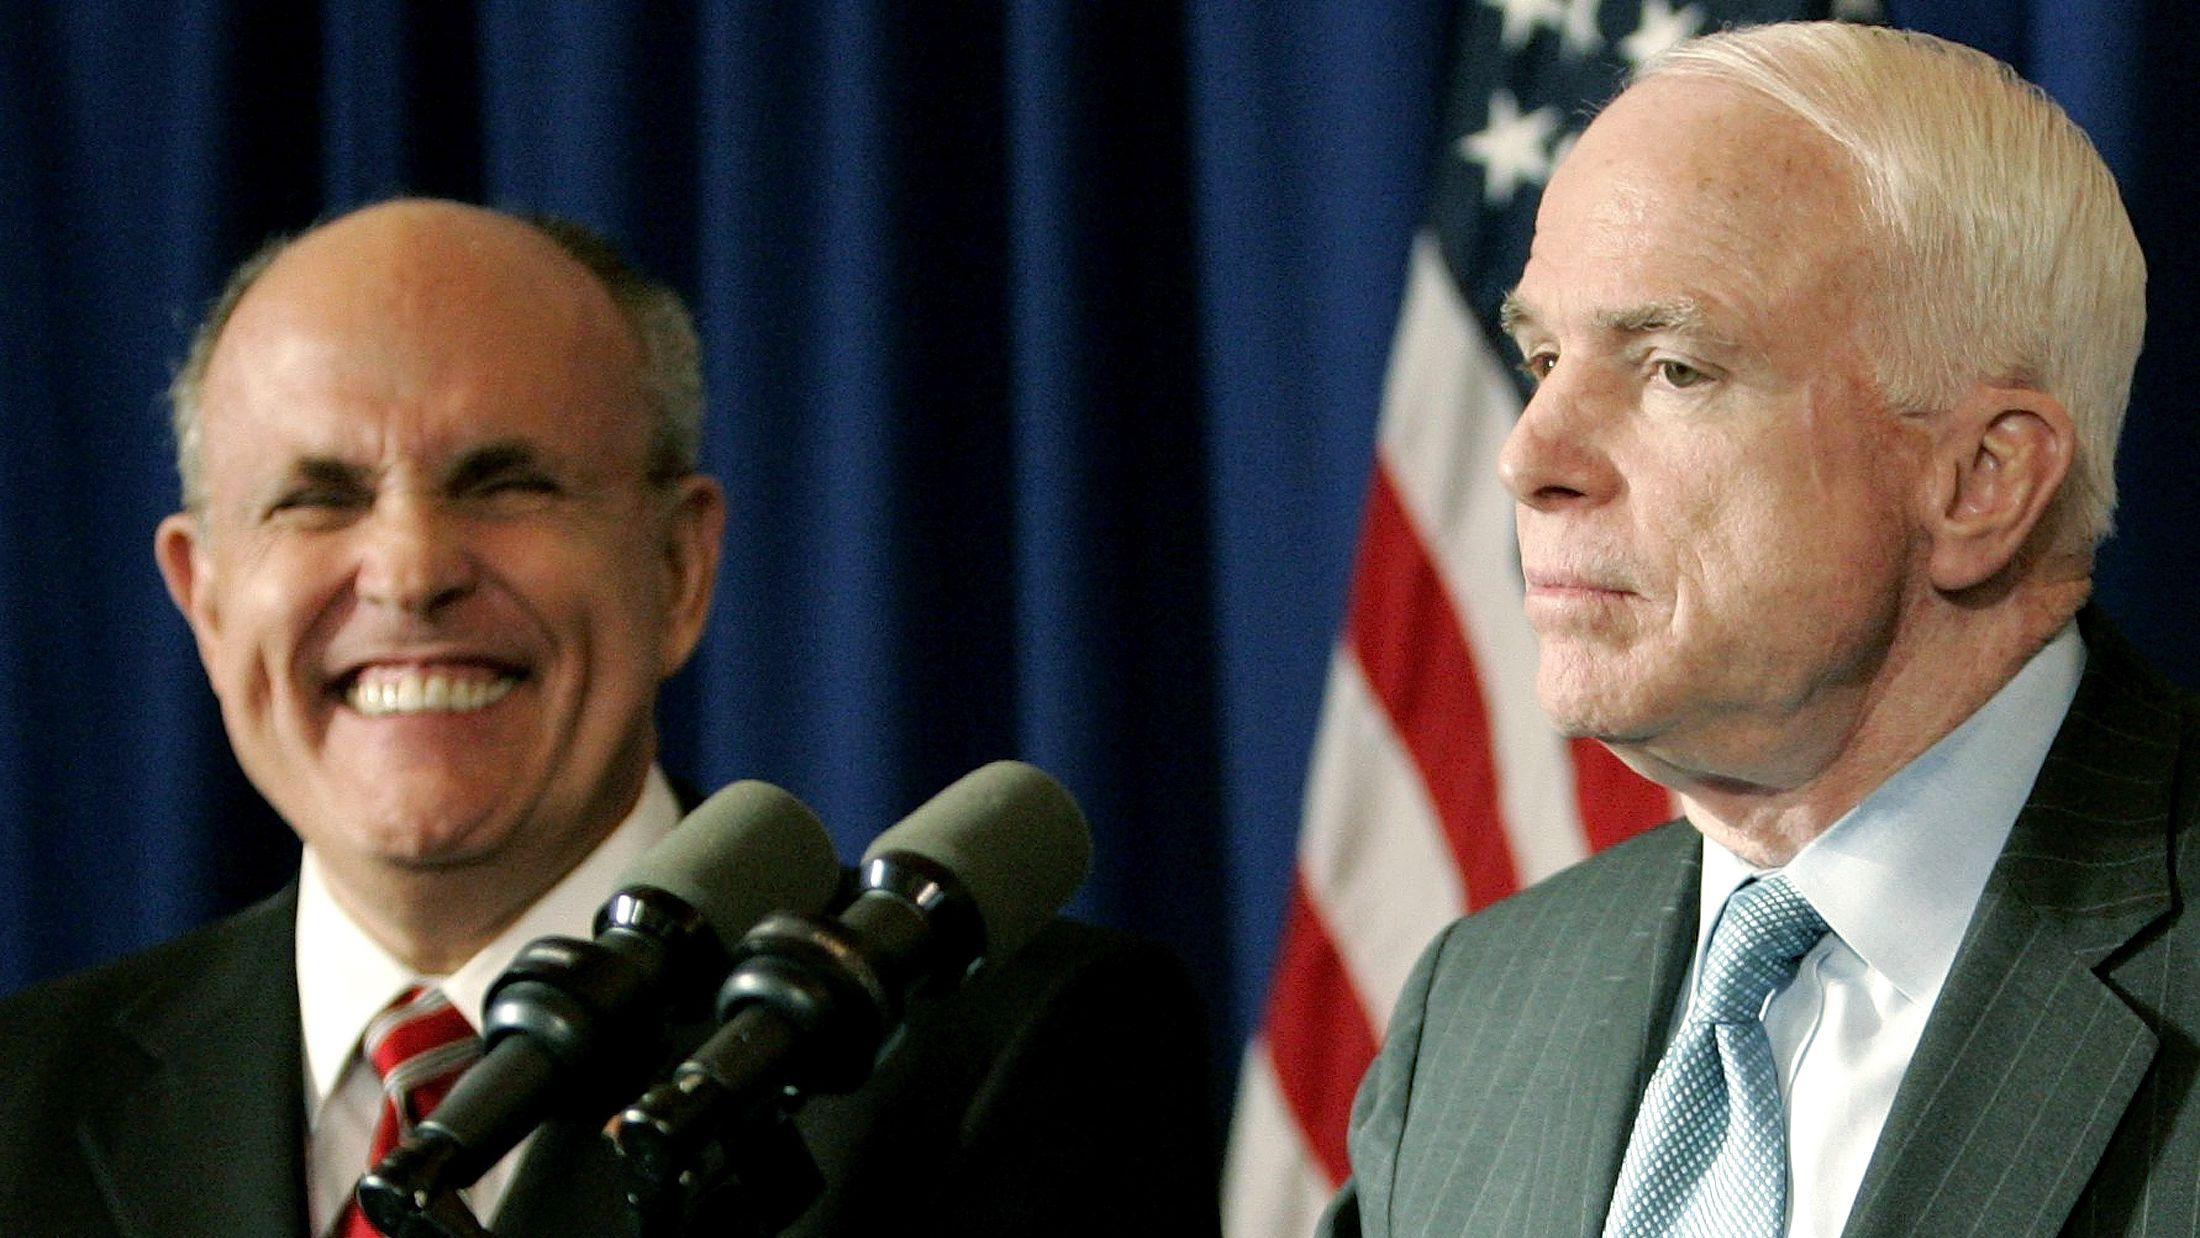 John McCain Rudy Giuliani